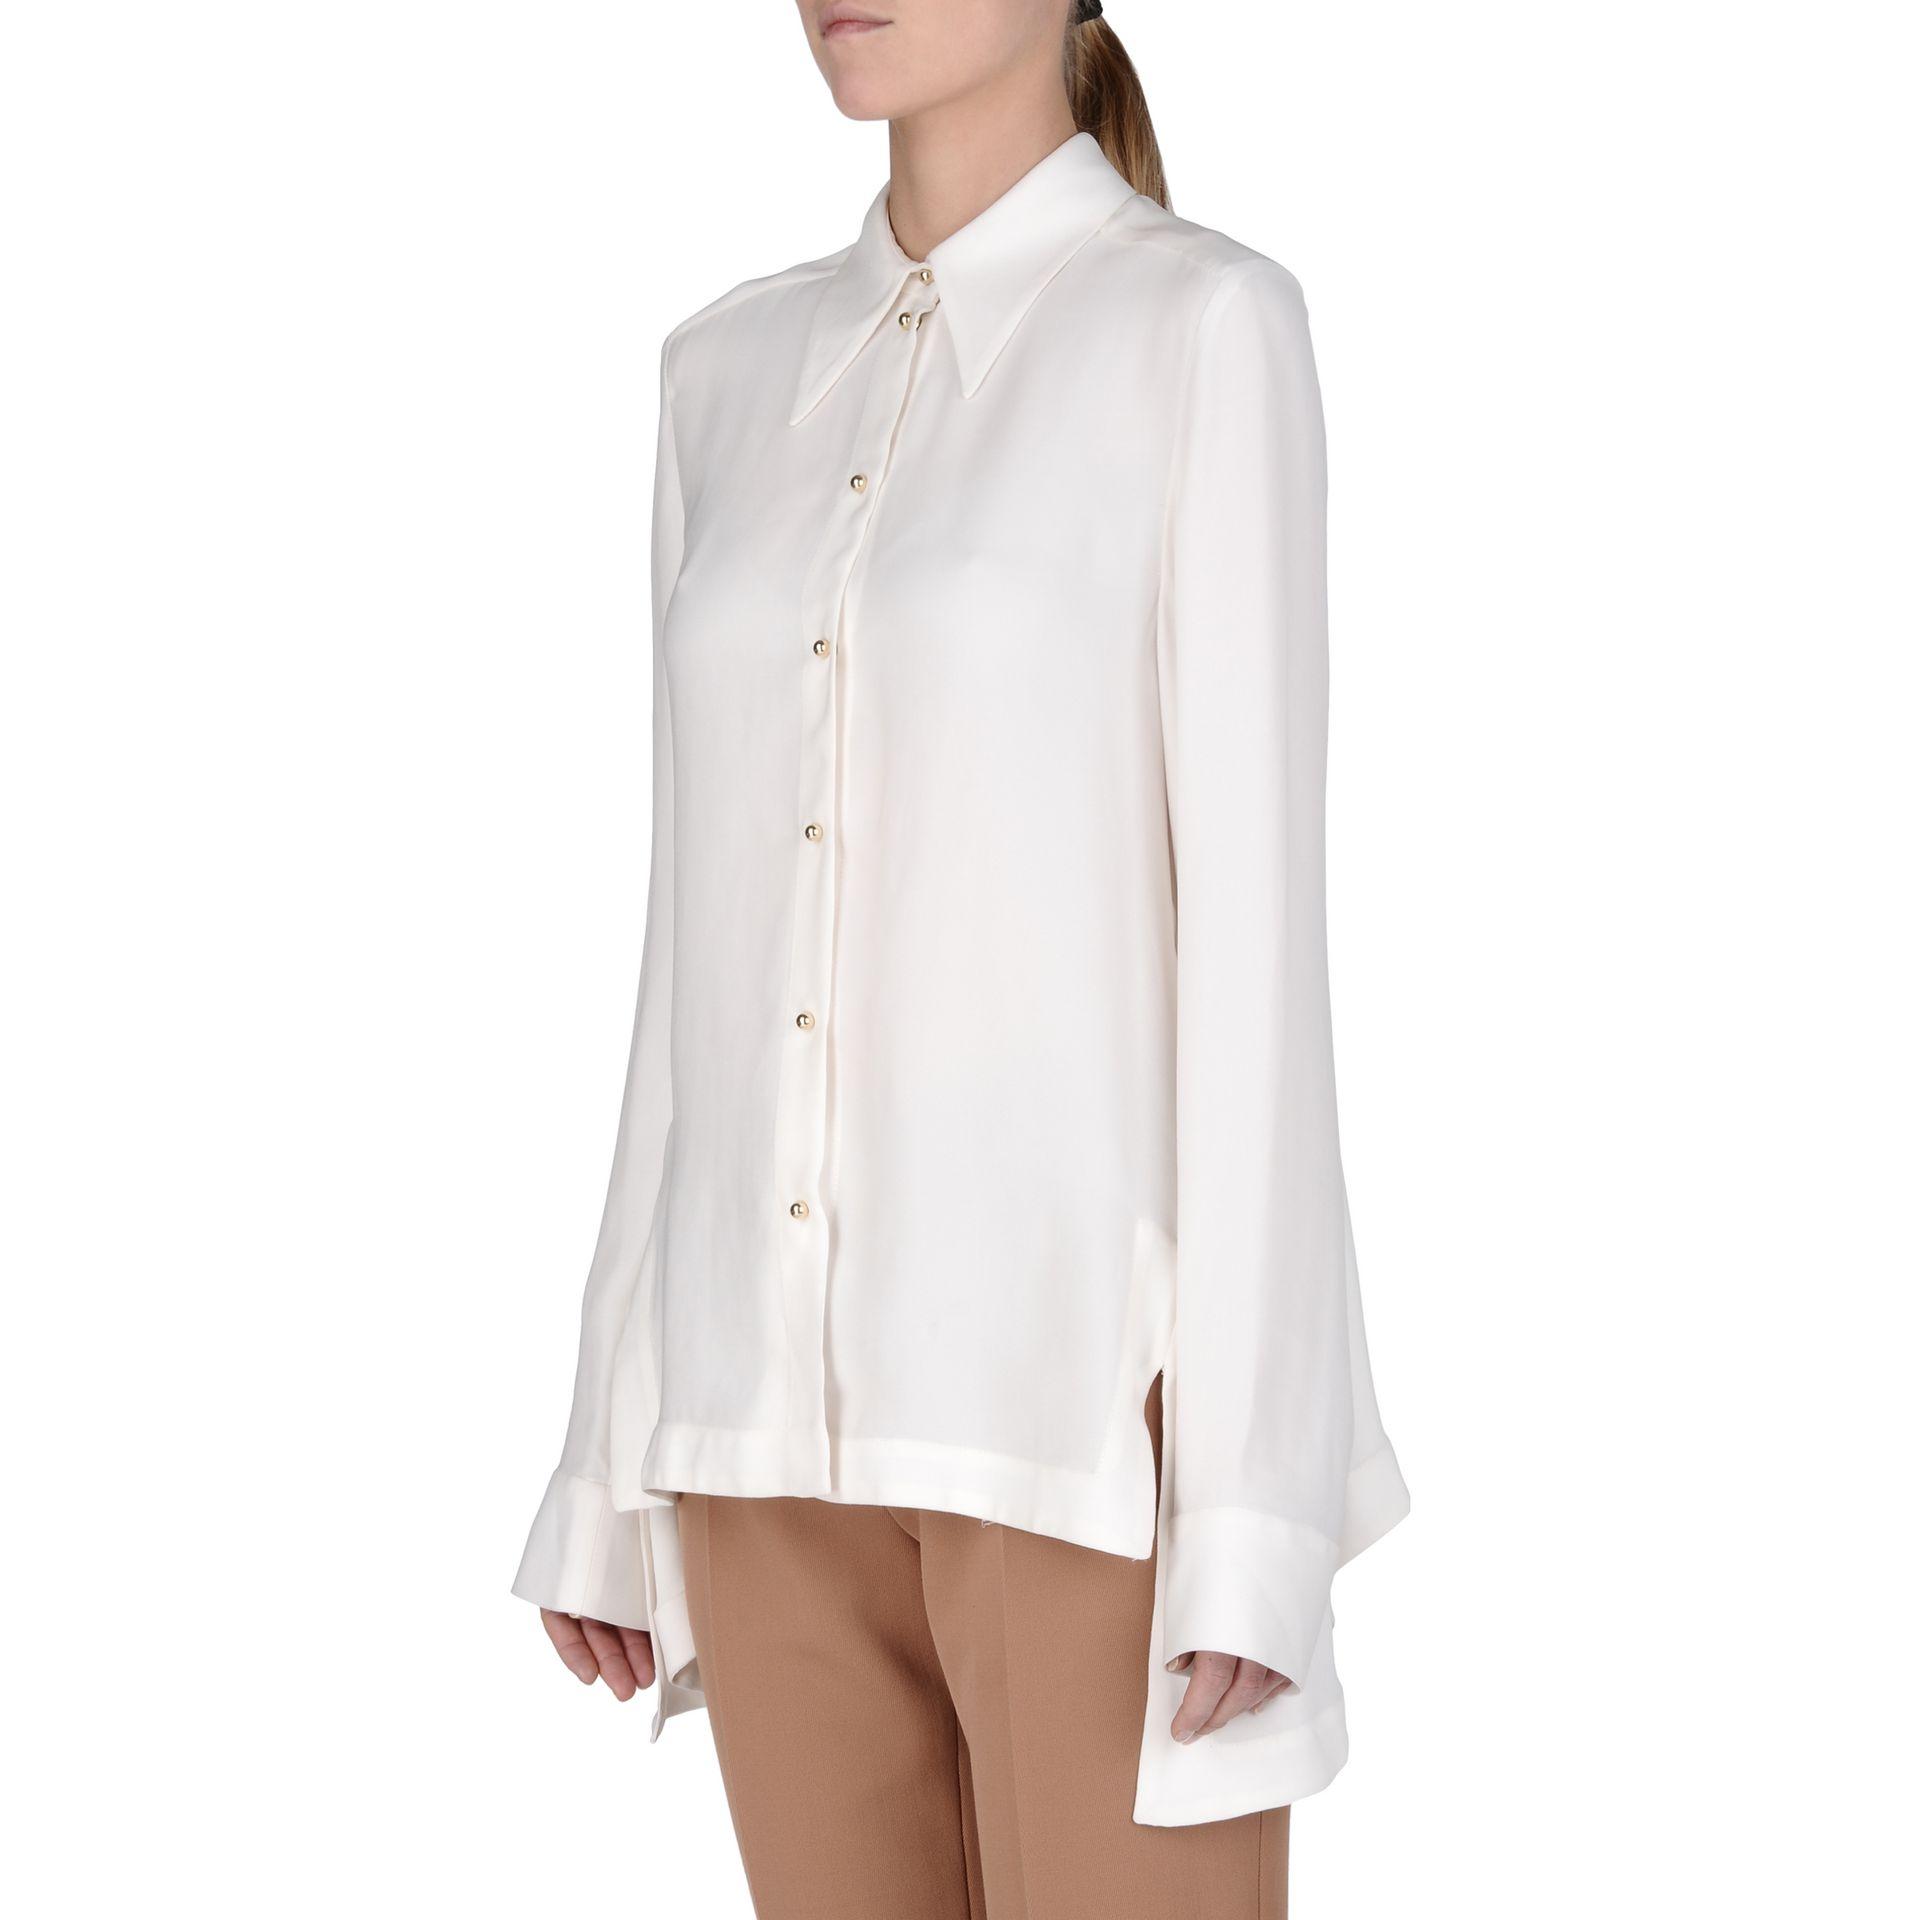 1a73891058dcdf Lyst - Stella McCartney Snow Drop Jones Shirt in White